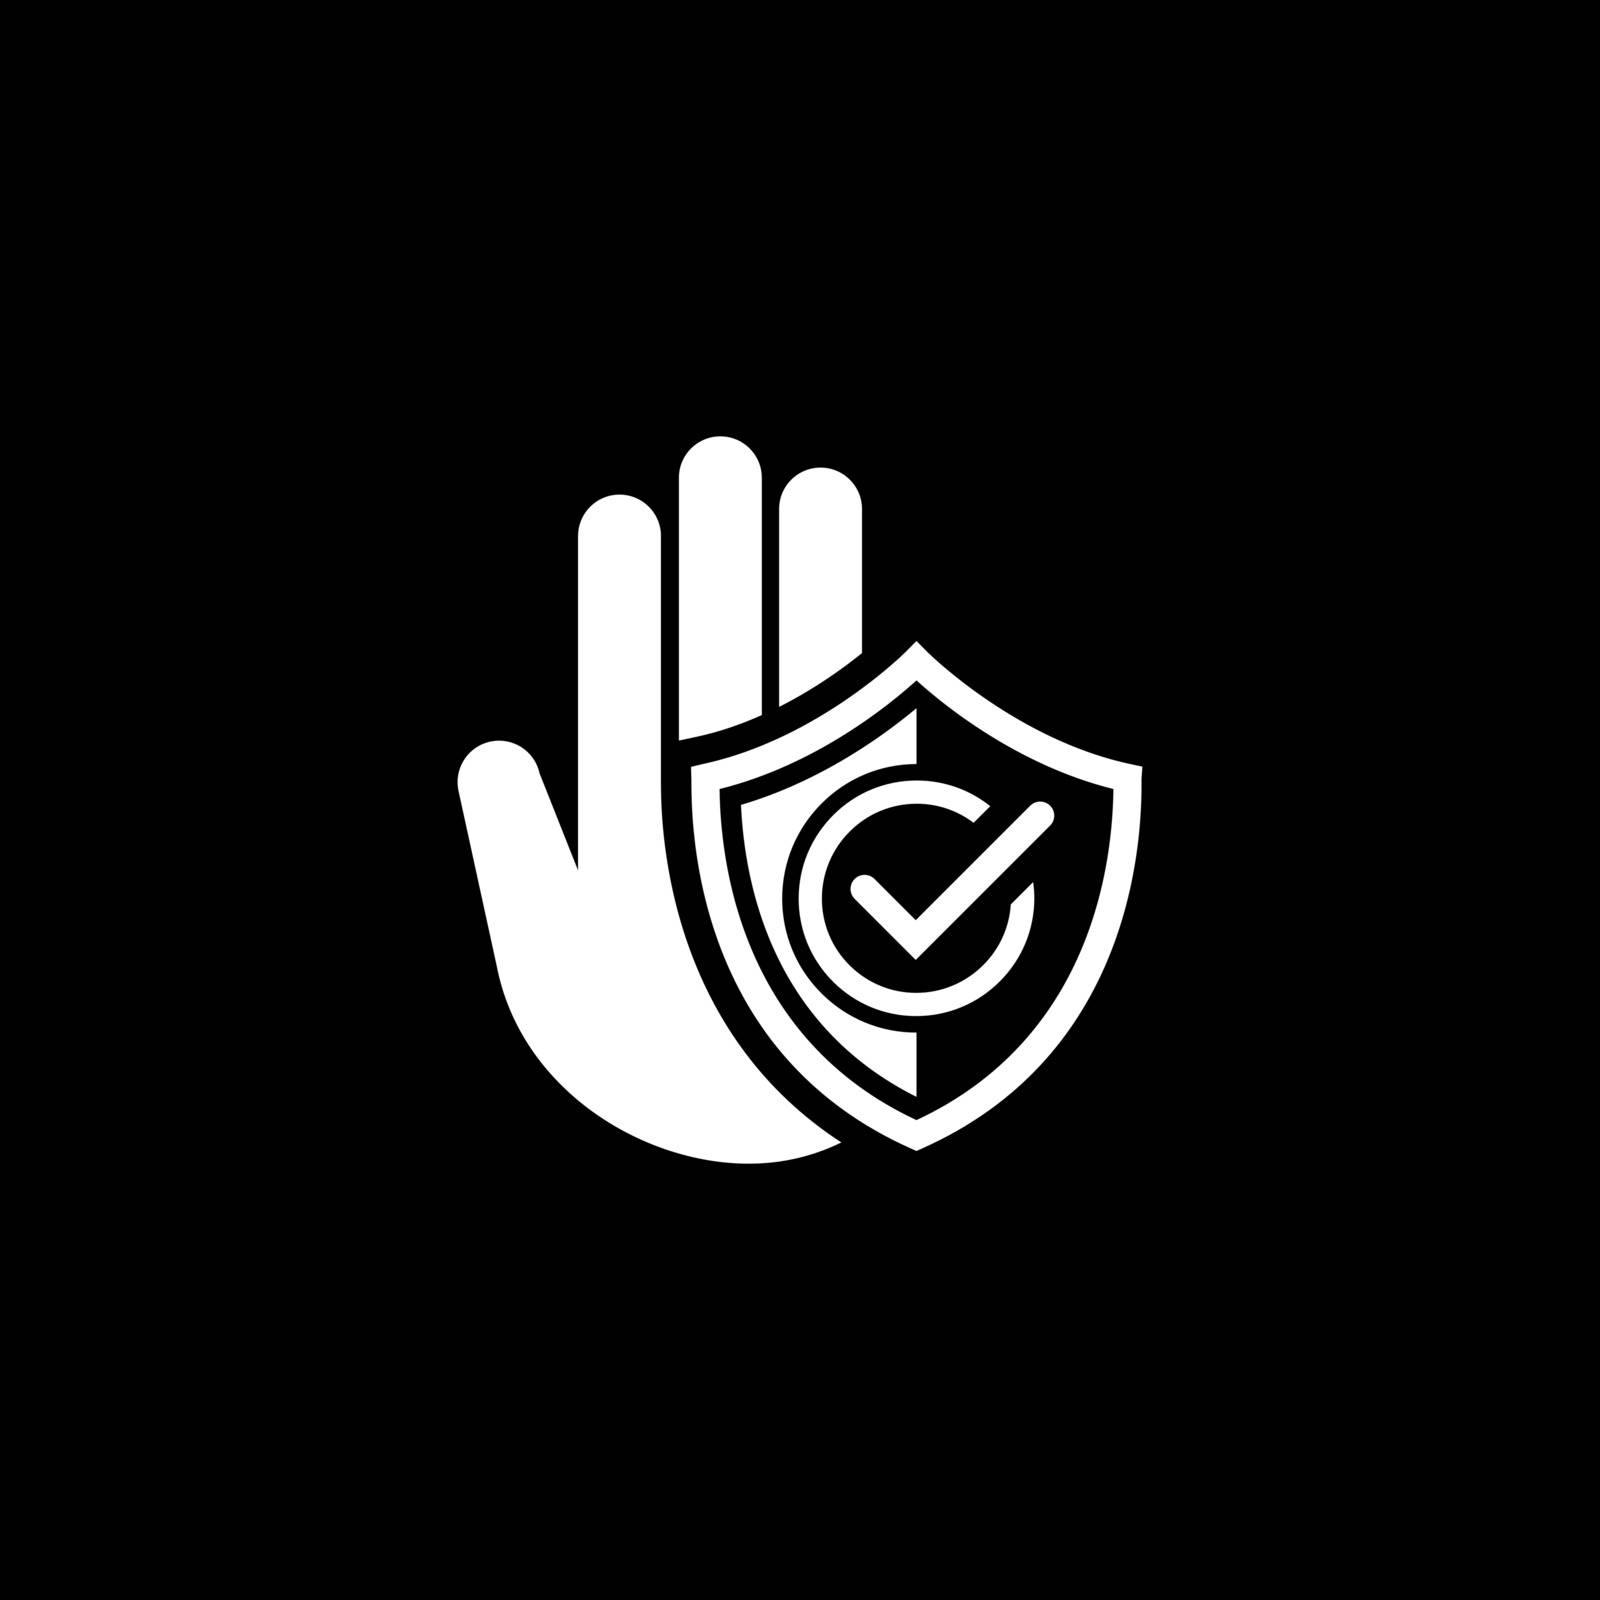 Secured Area Icon. Flat Design Isolated Illustration.